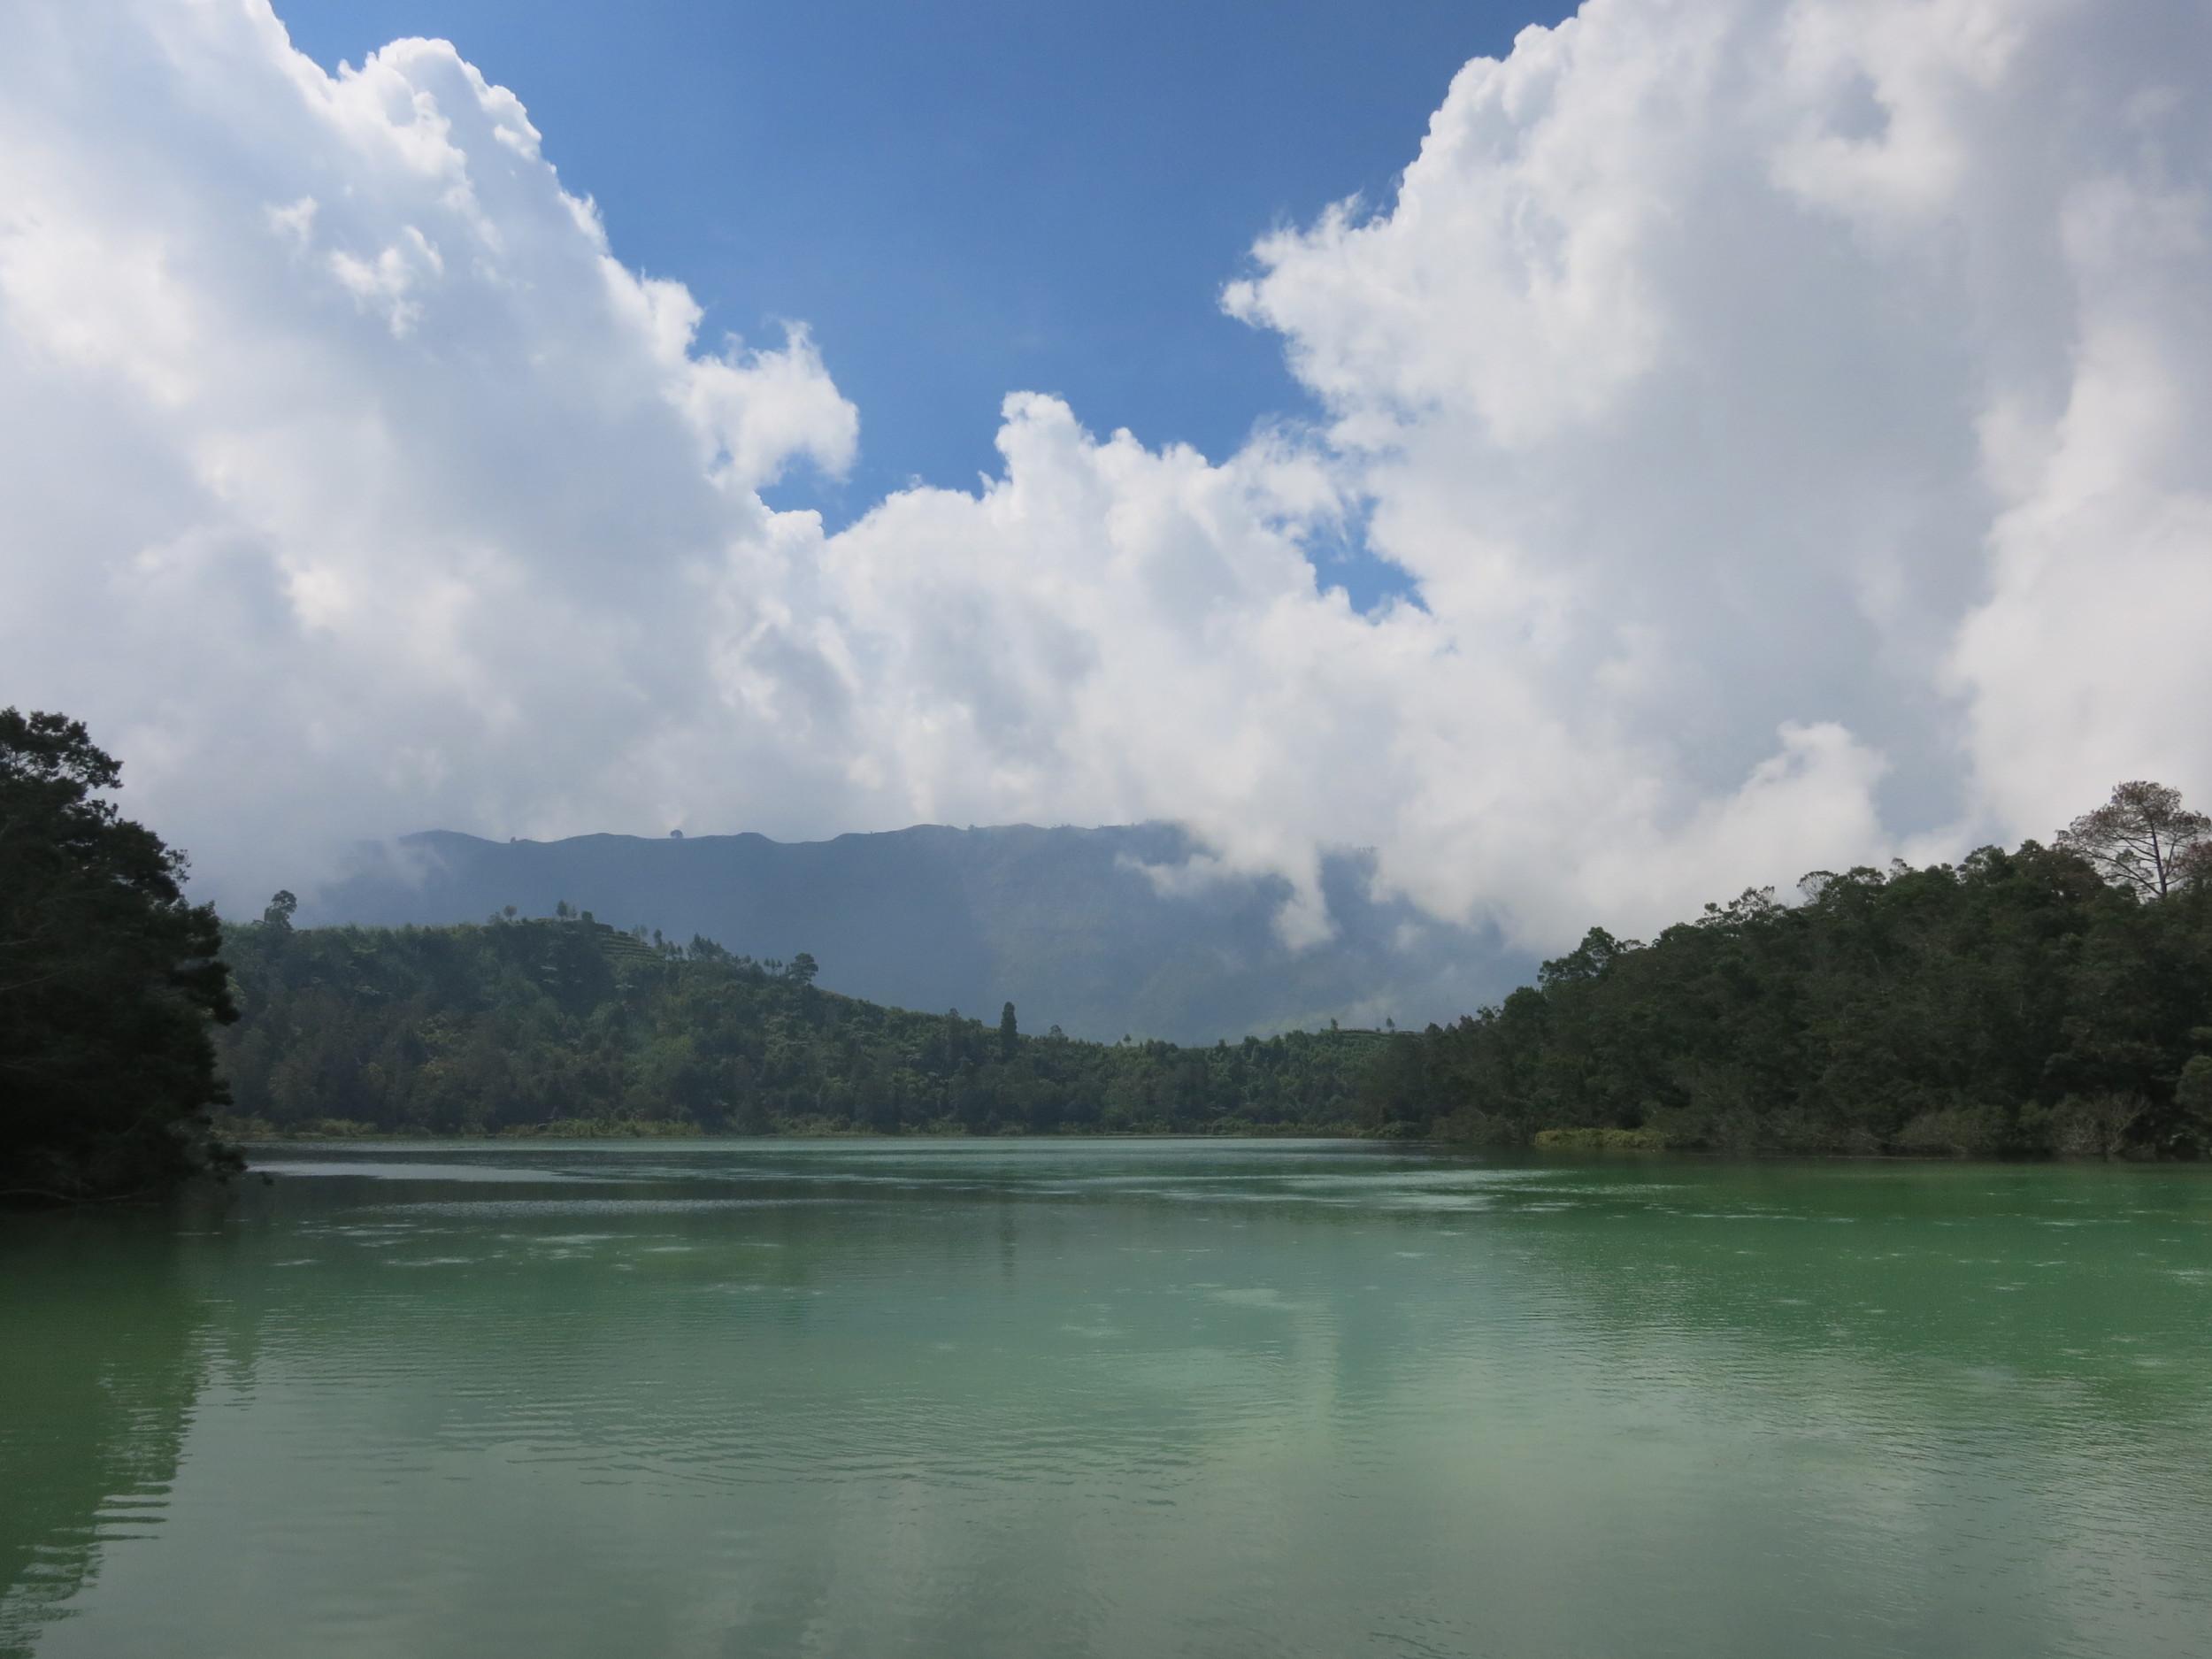 A sulfuric lake